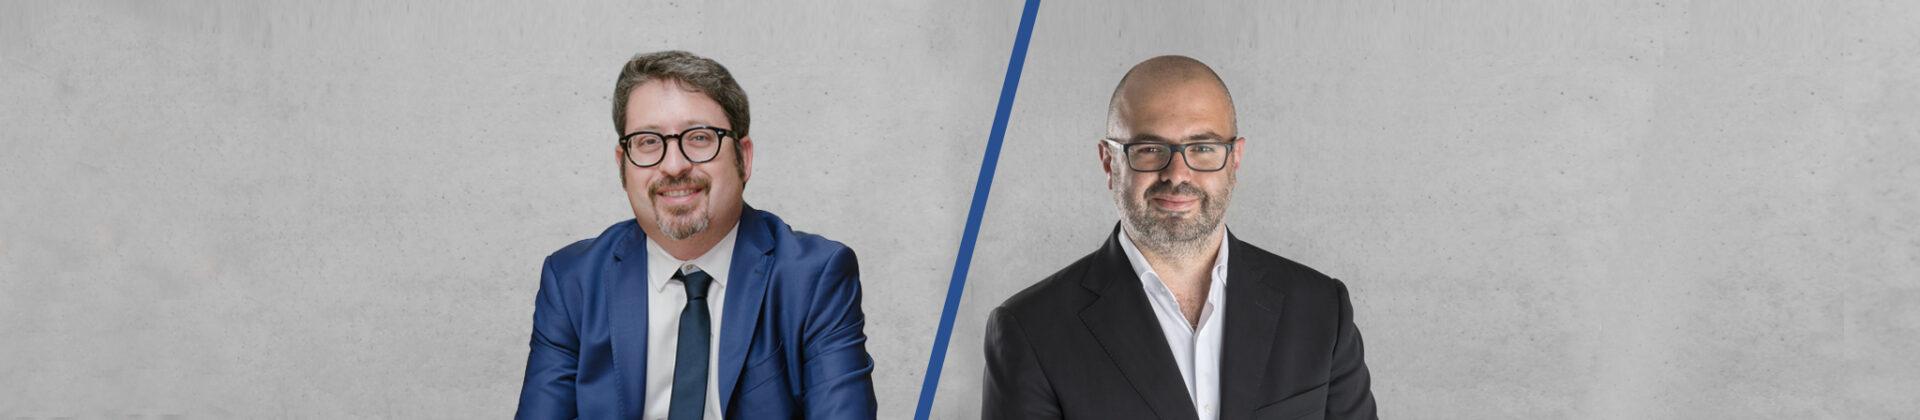 cortexa-presidente-pavan-marcucci